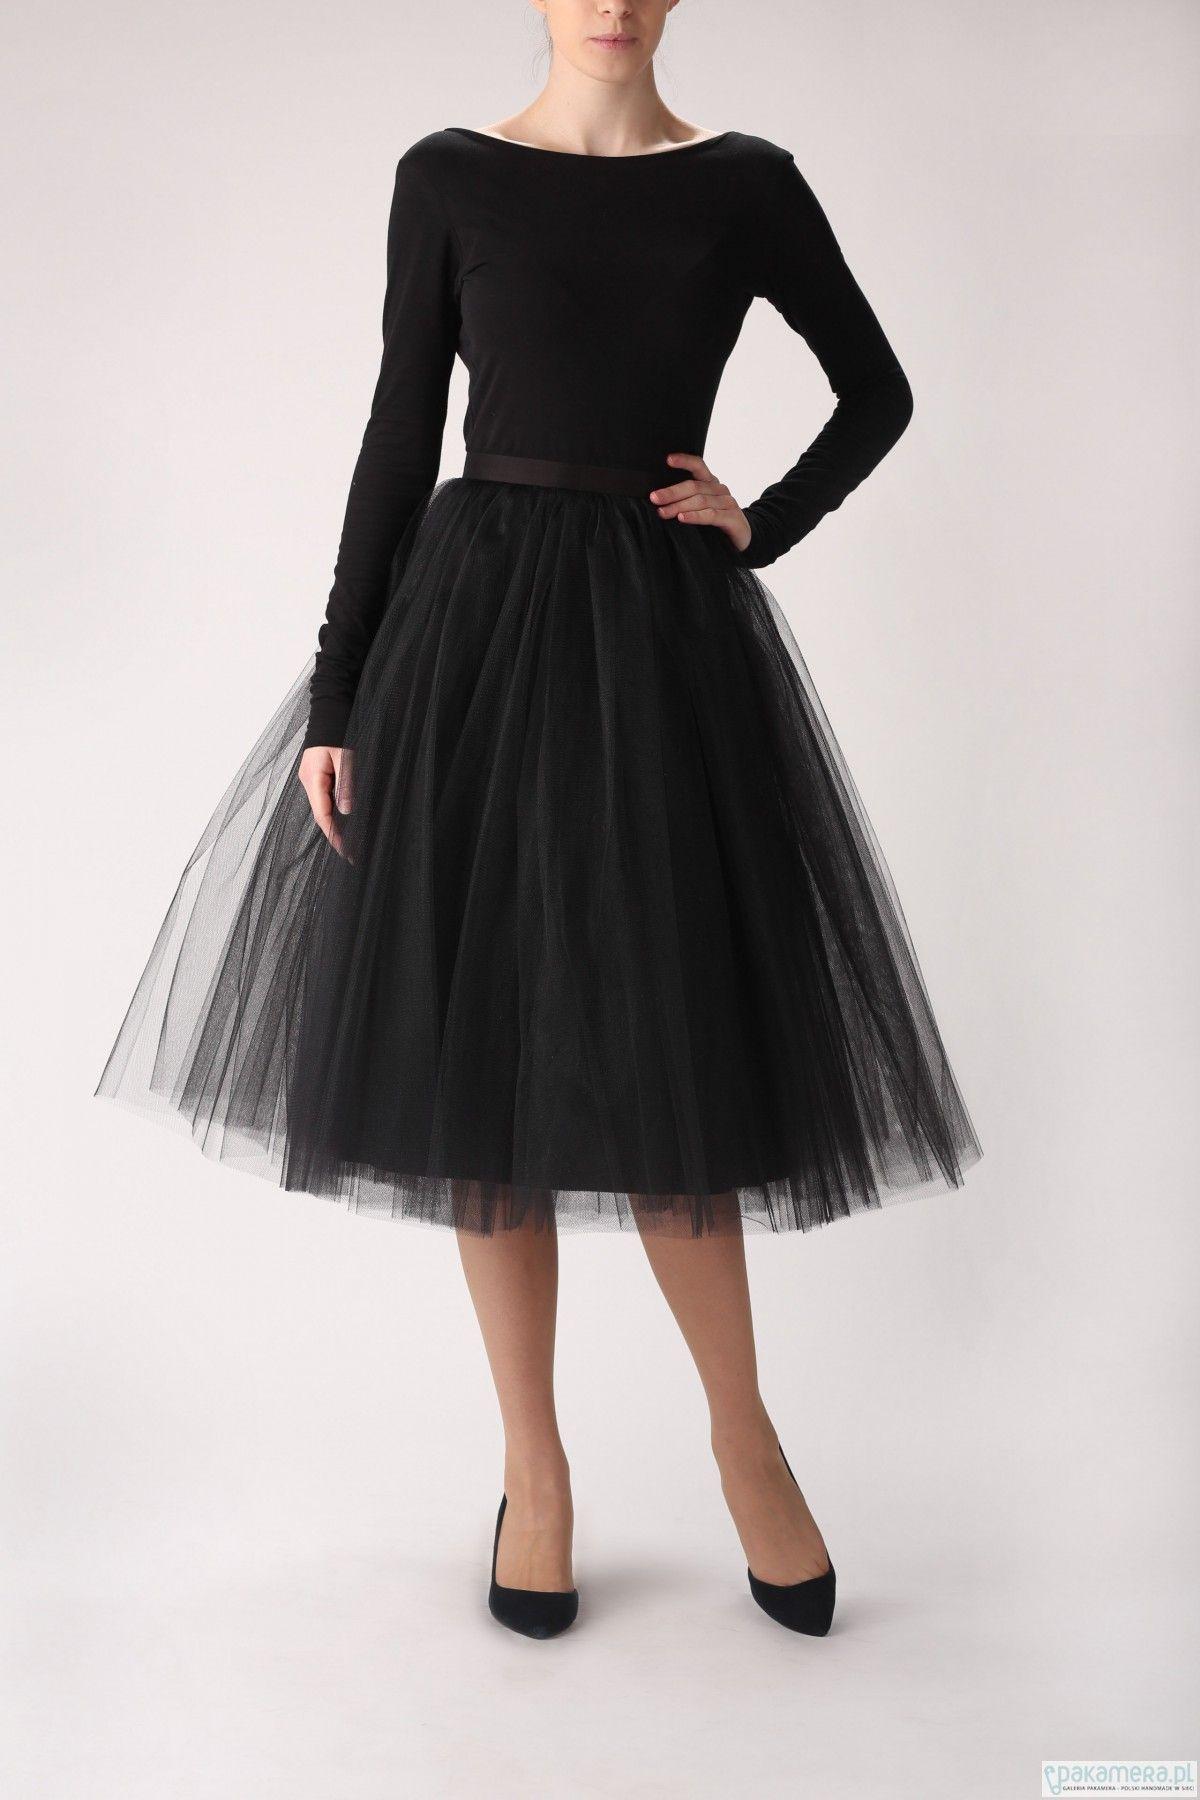 Fashion fashion pinterest fashion clothes and tulle skirts